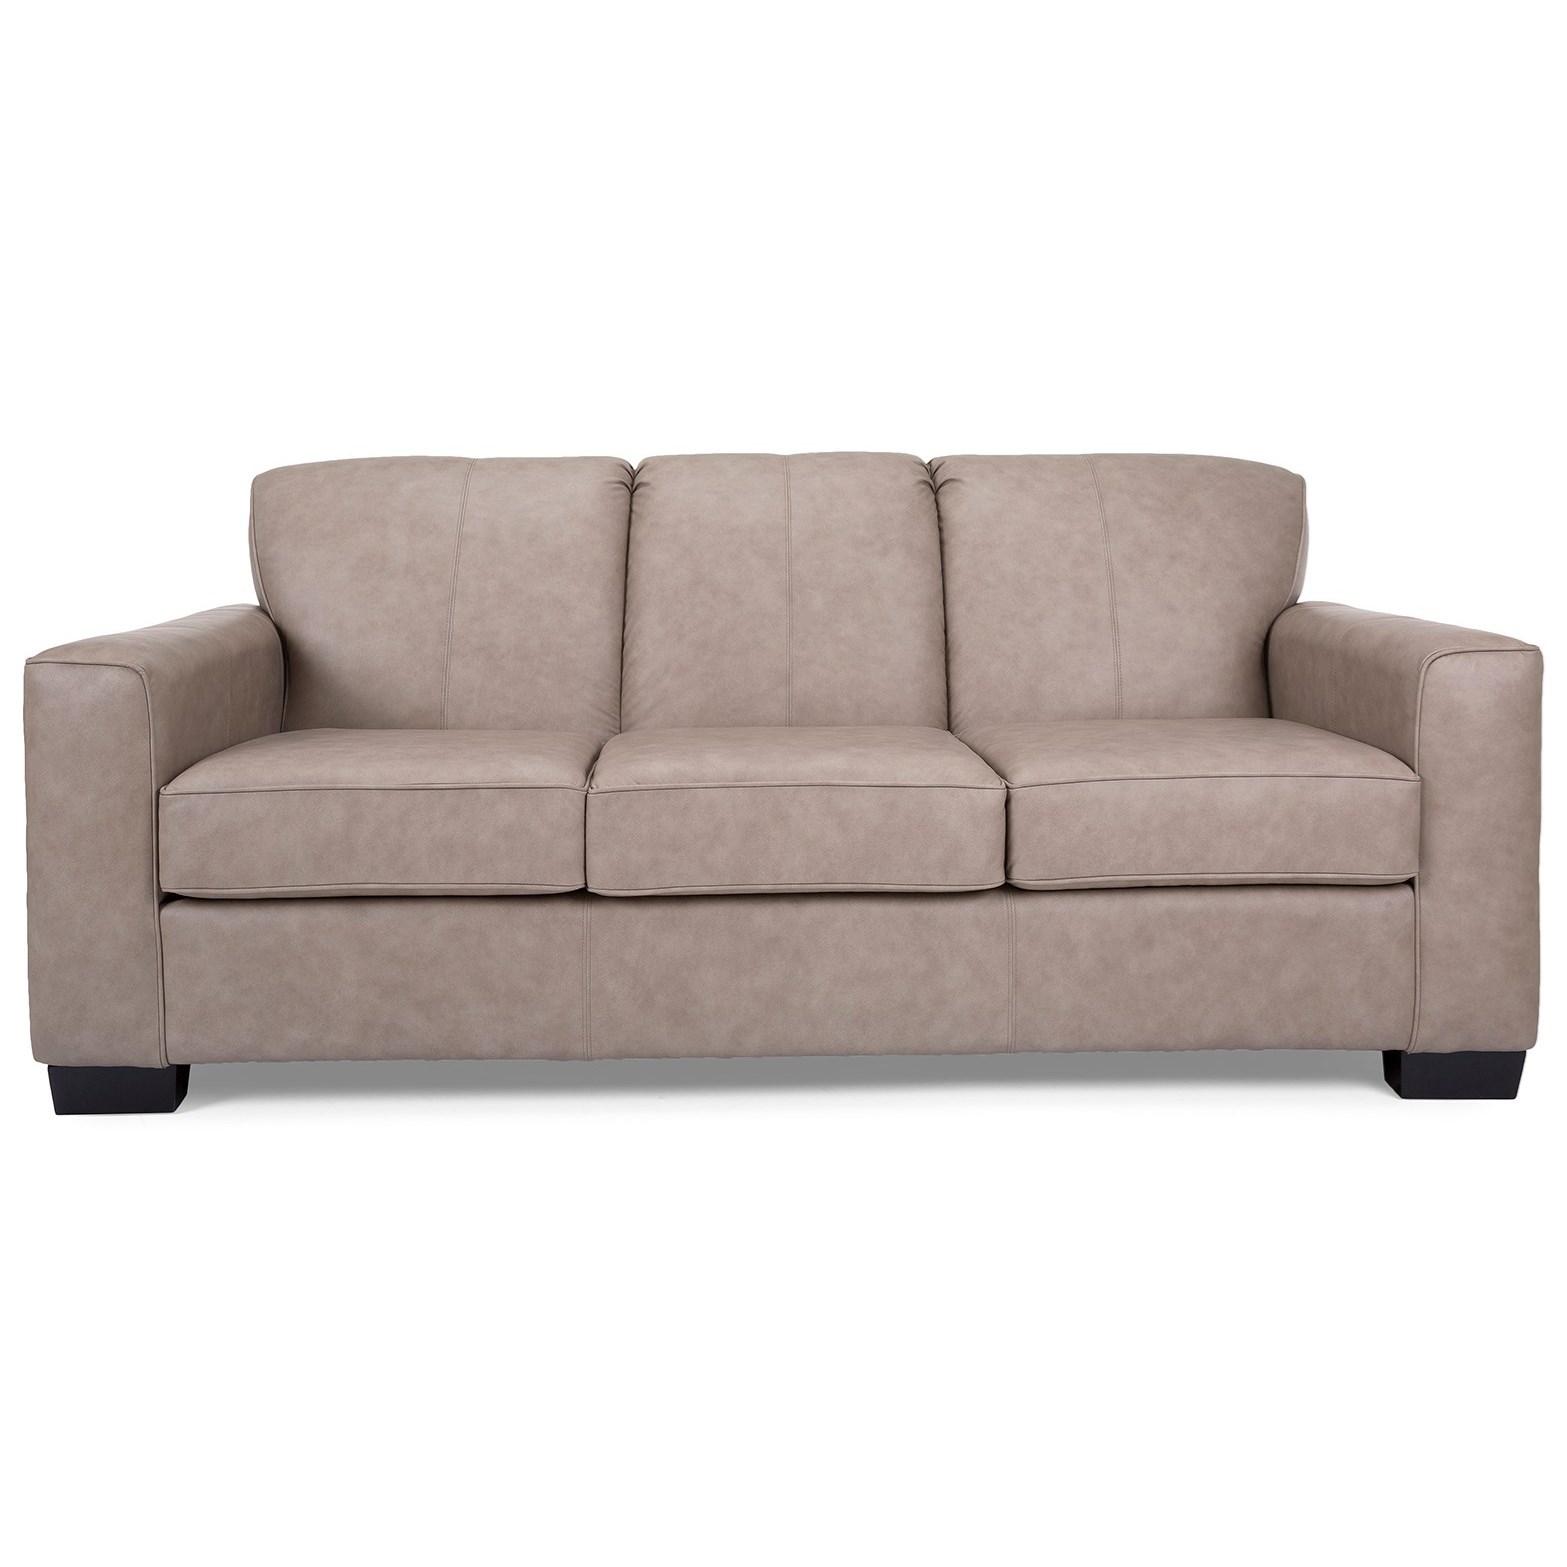 2705 Sofa Sleeper by Decor-Rest at Reid's Furniture